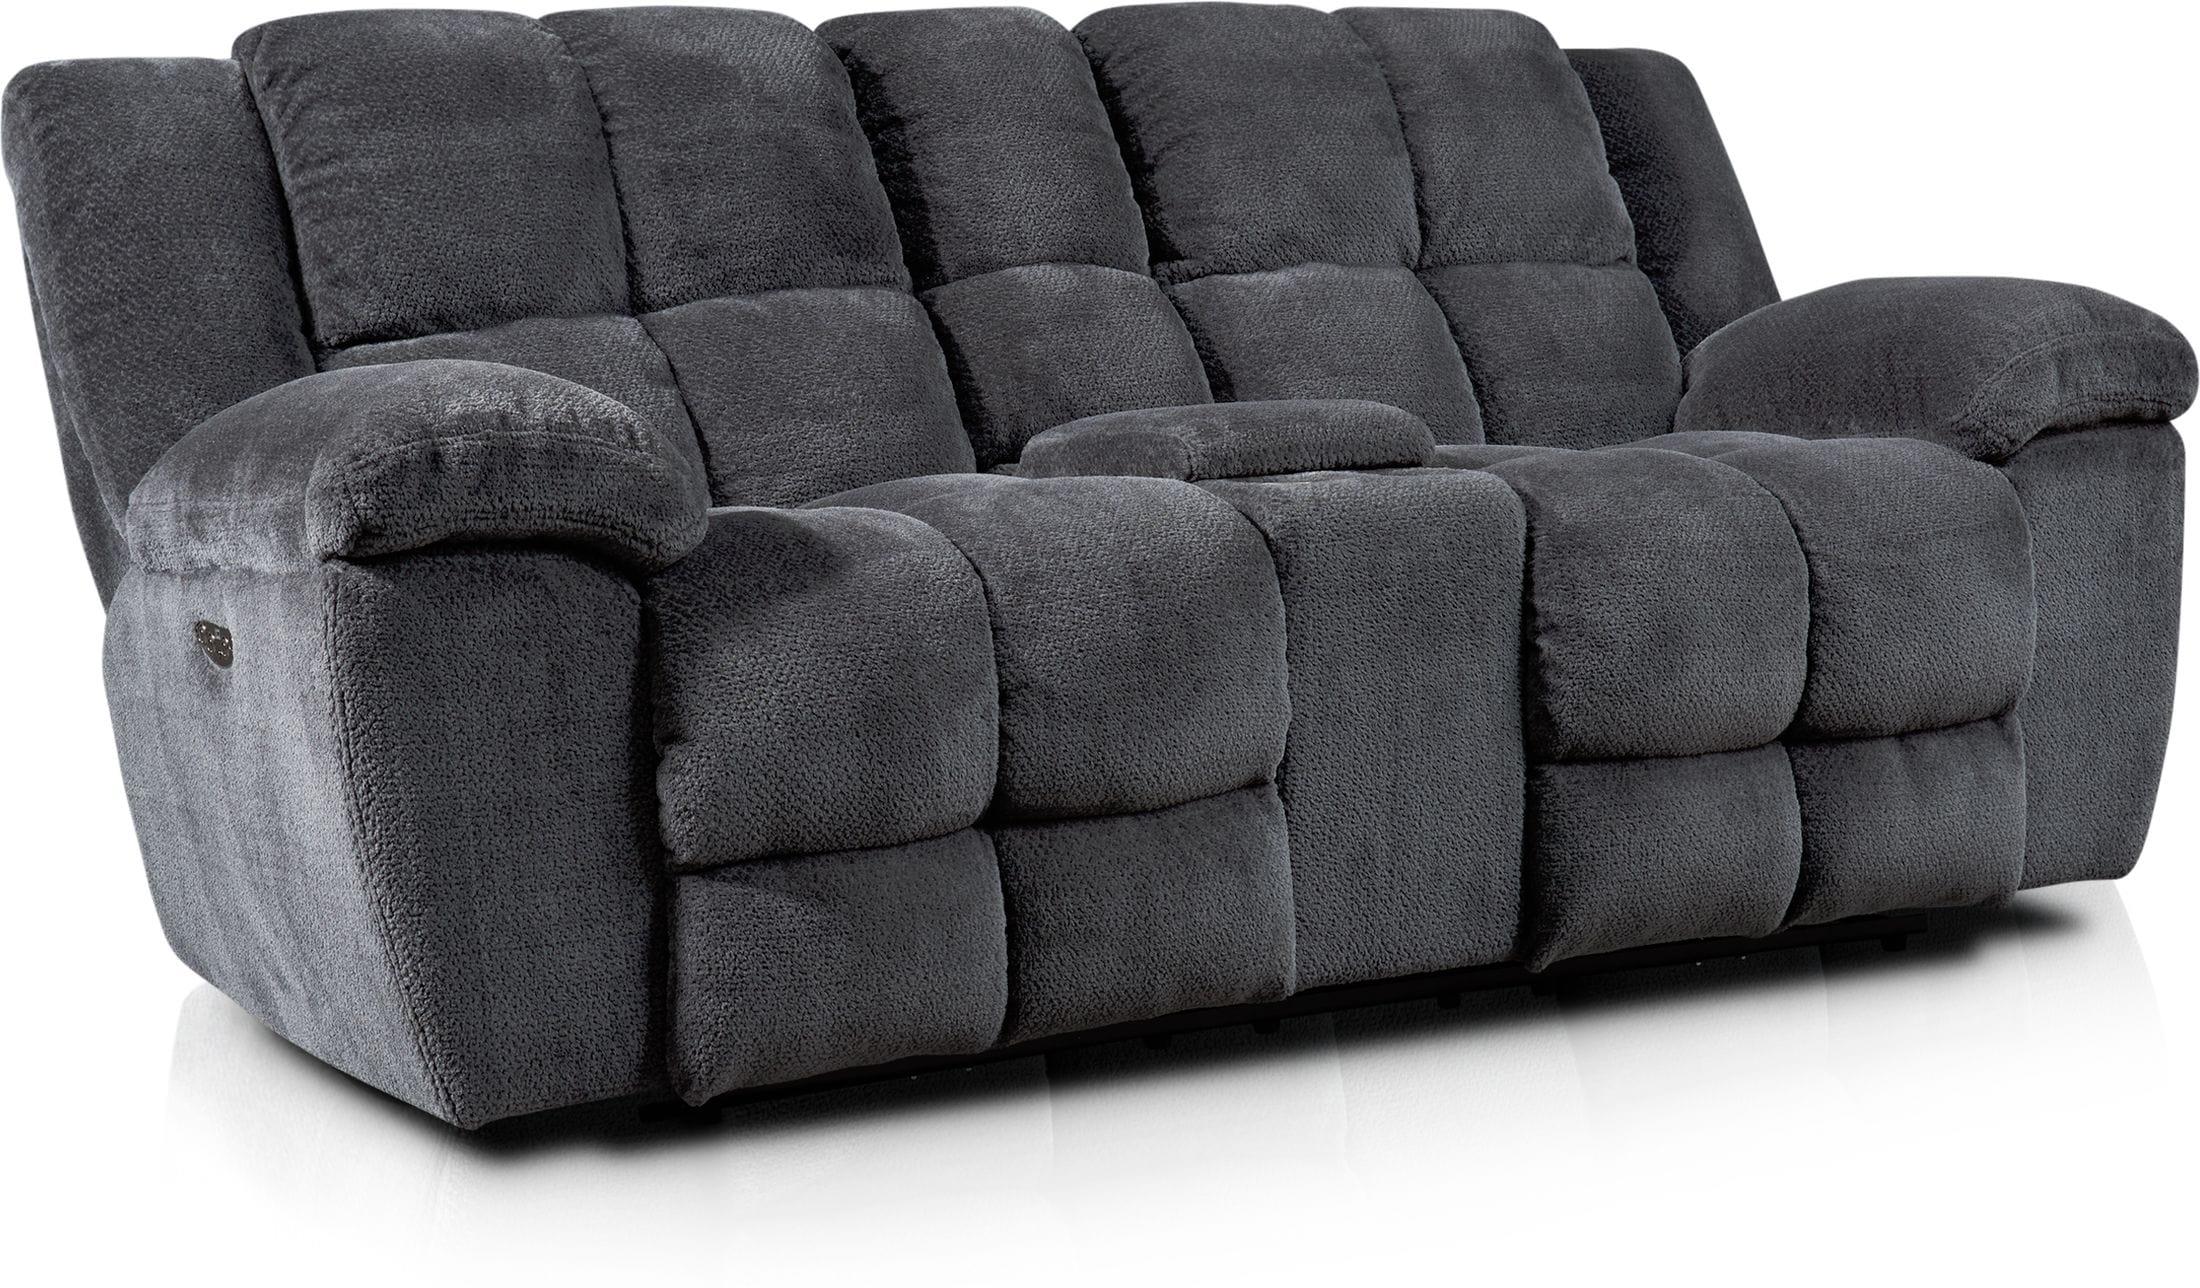 Living Room Furniture - Mellow Dual-Power Reclining Loveseat - Gray